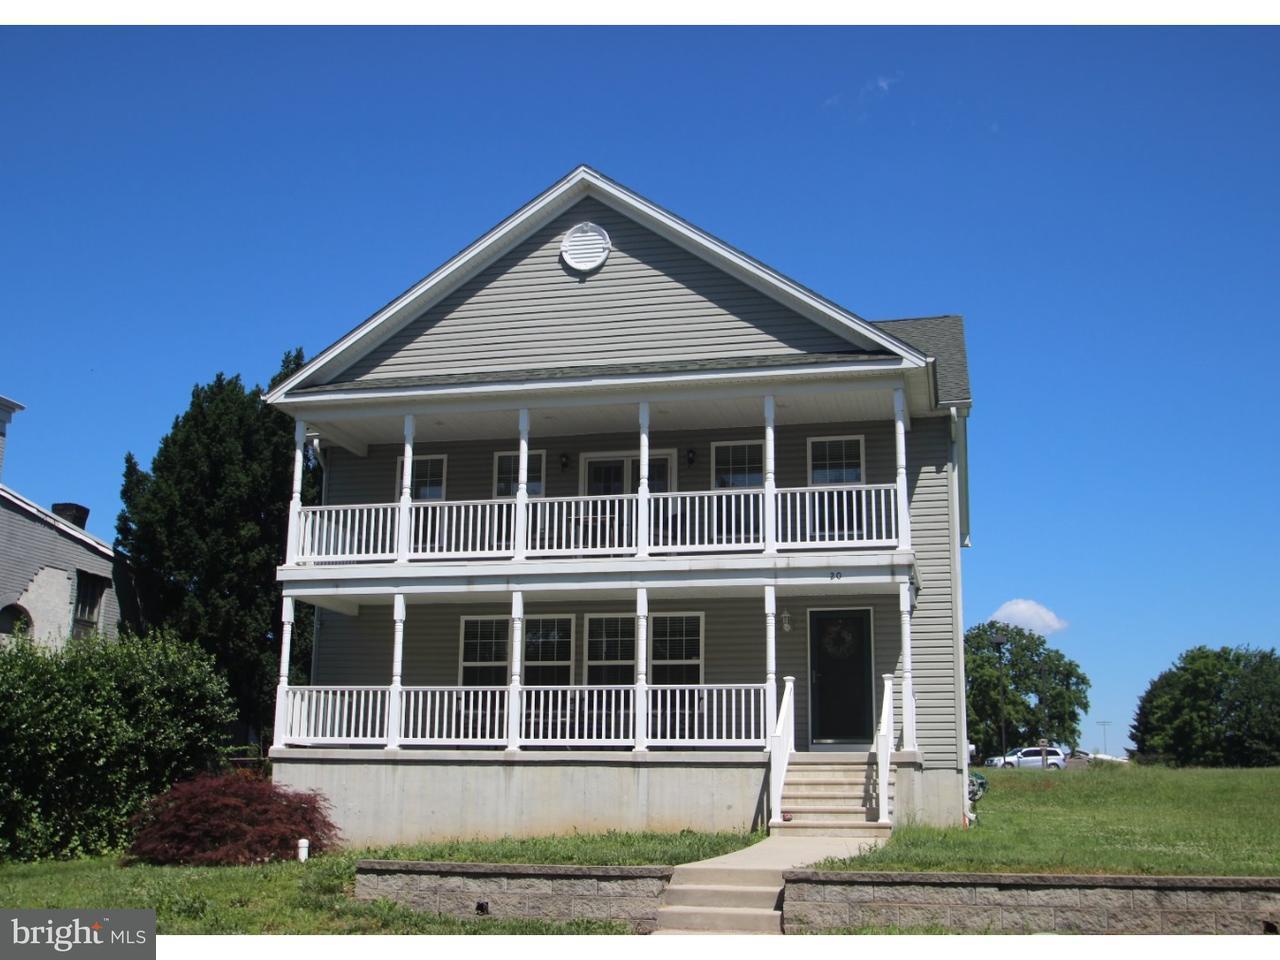 Single Family Home for Sale at 20 E DELAWARE Avenue Marcus Hook, Pennsylvania 19061 United States